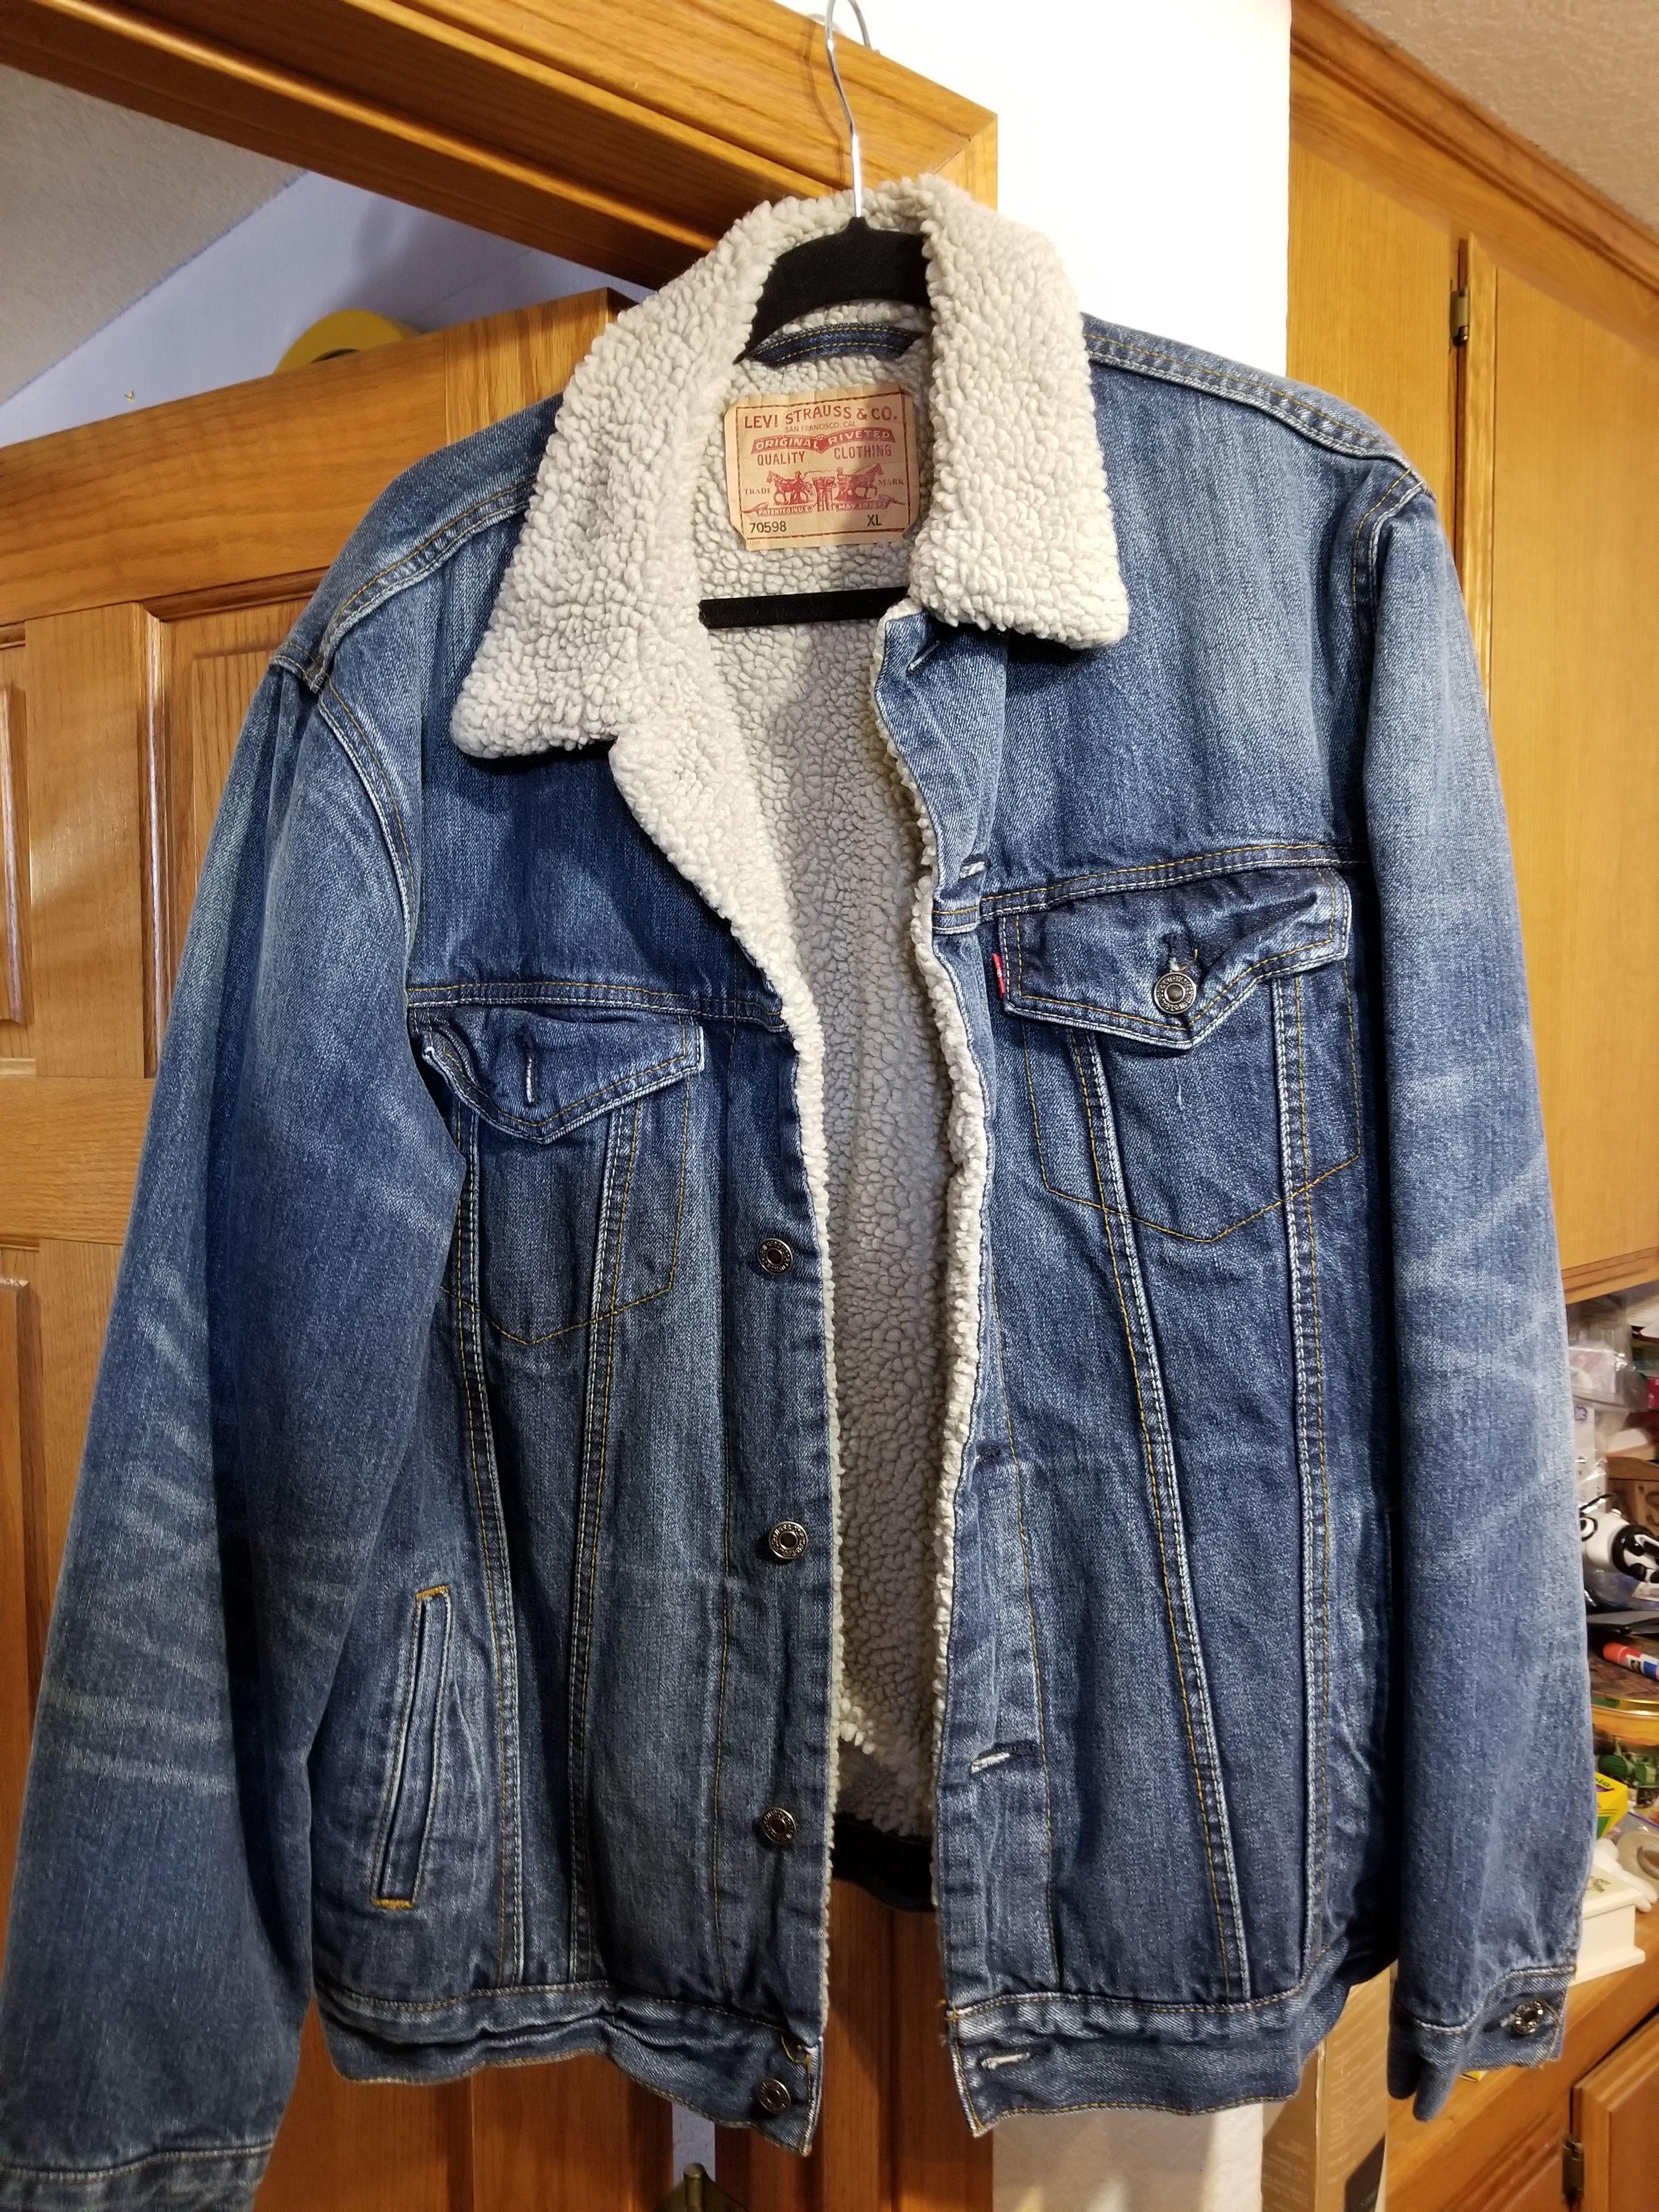 ackets Railroad jackets, Dodgers jersey, Levi jackets winter jackets mint condition